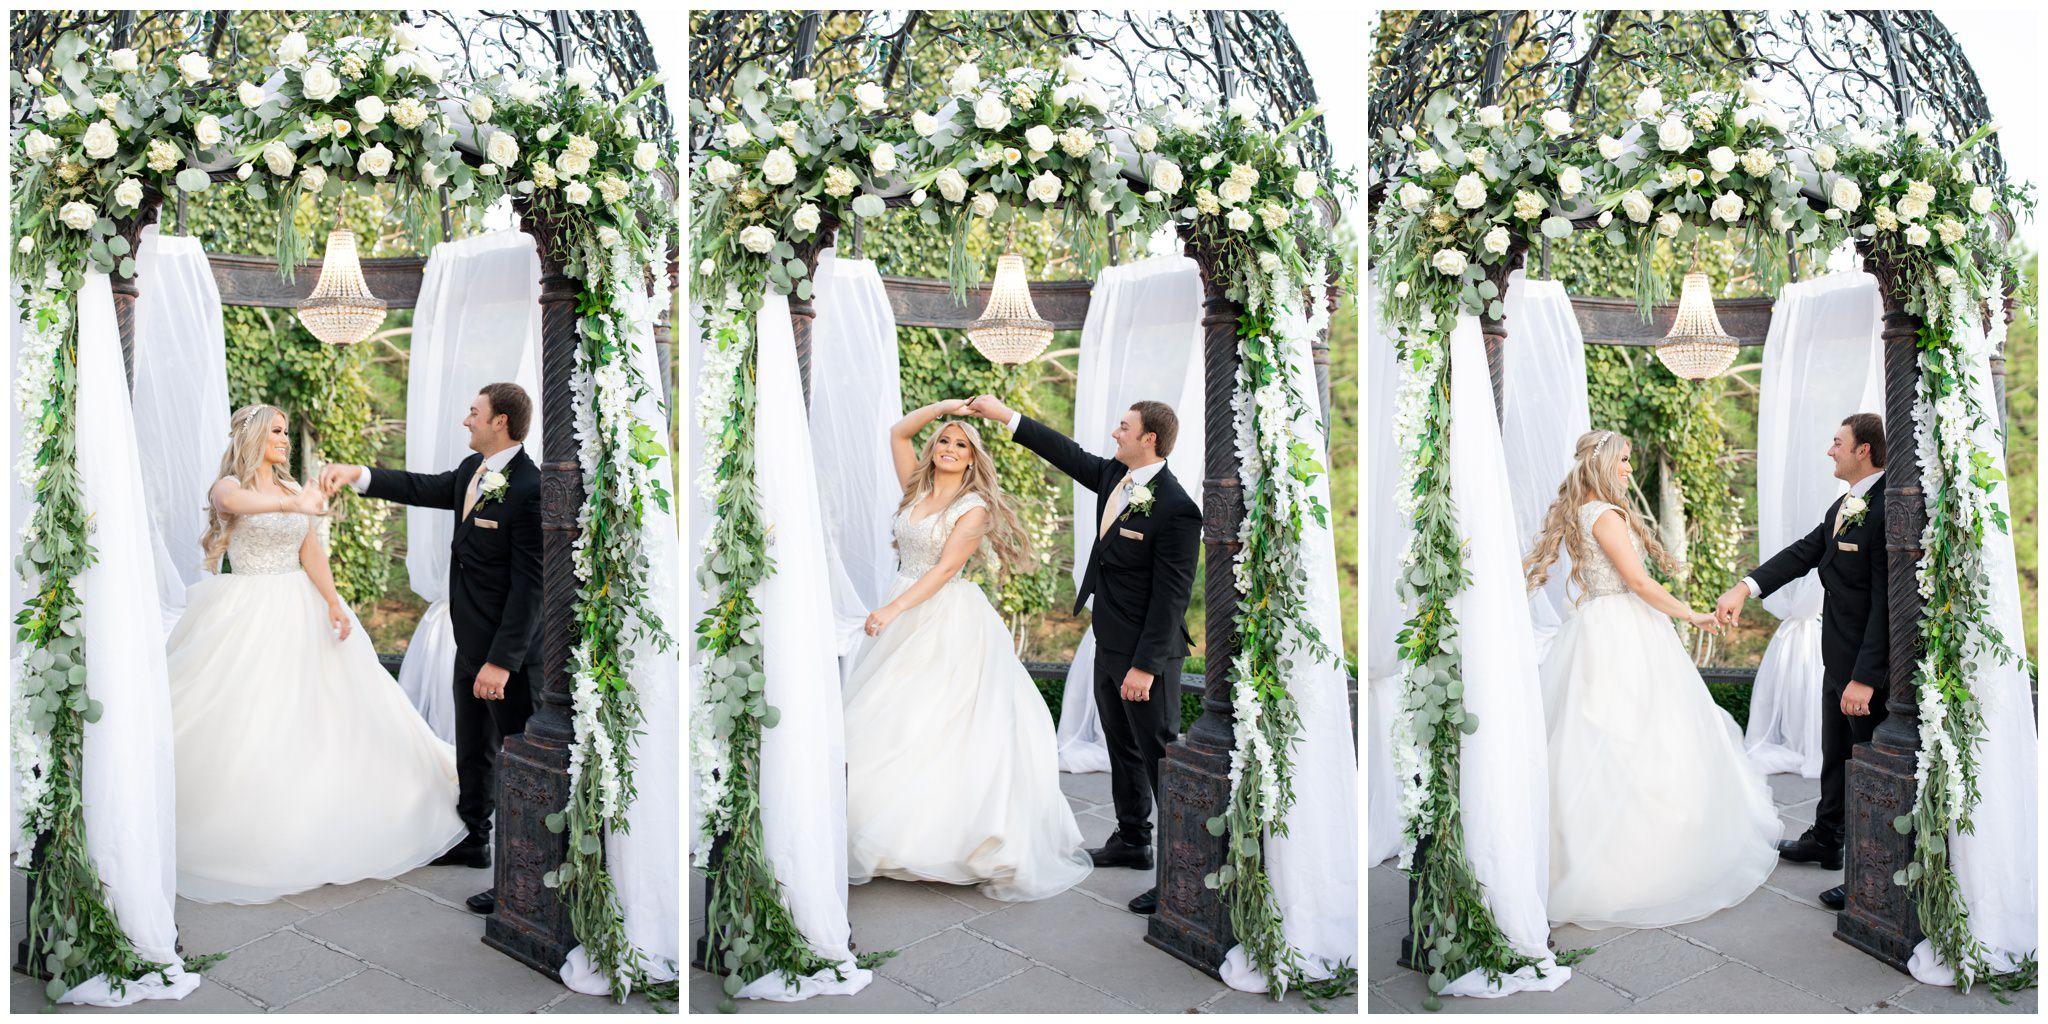 Bride and groom twirling under the gazebo at sleepy ridge